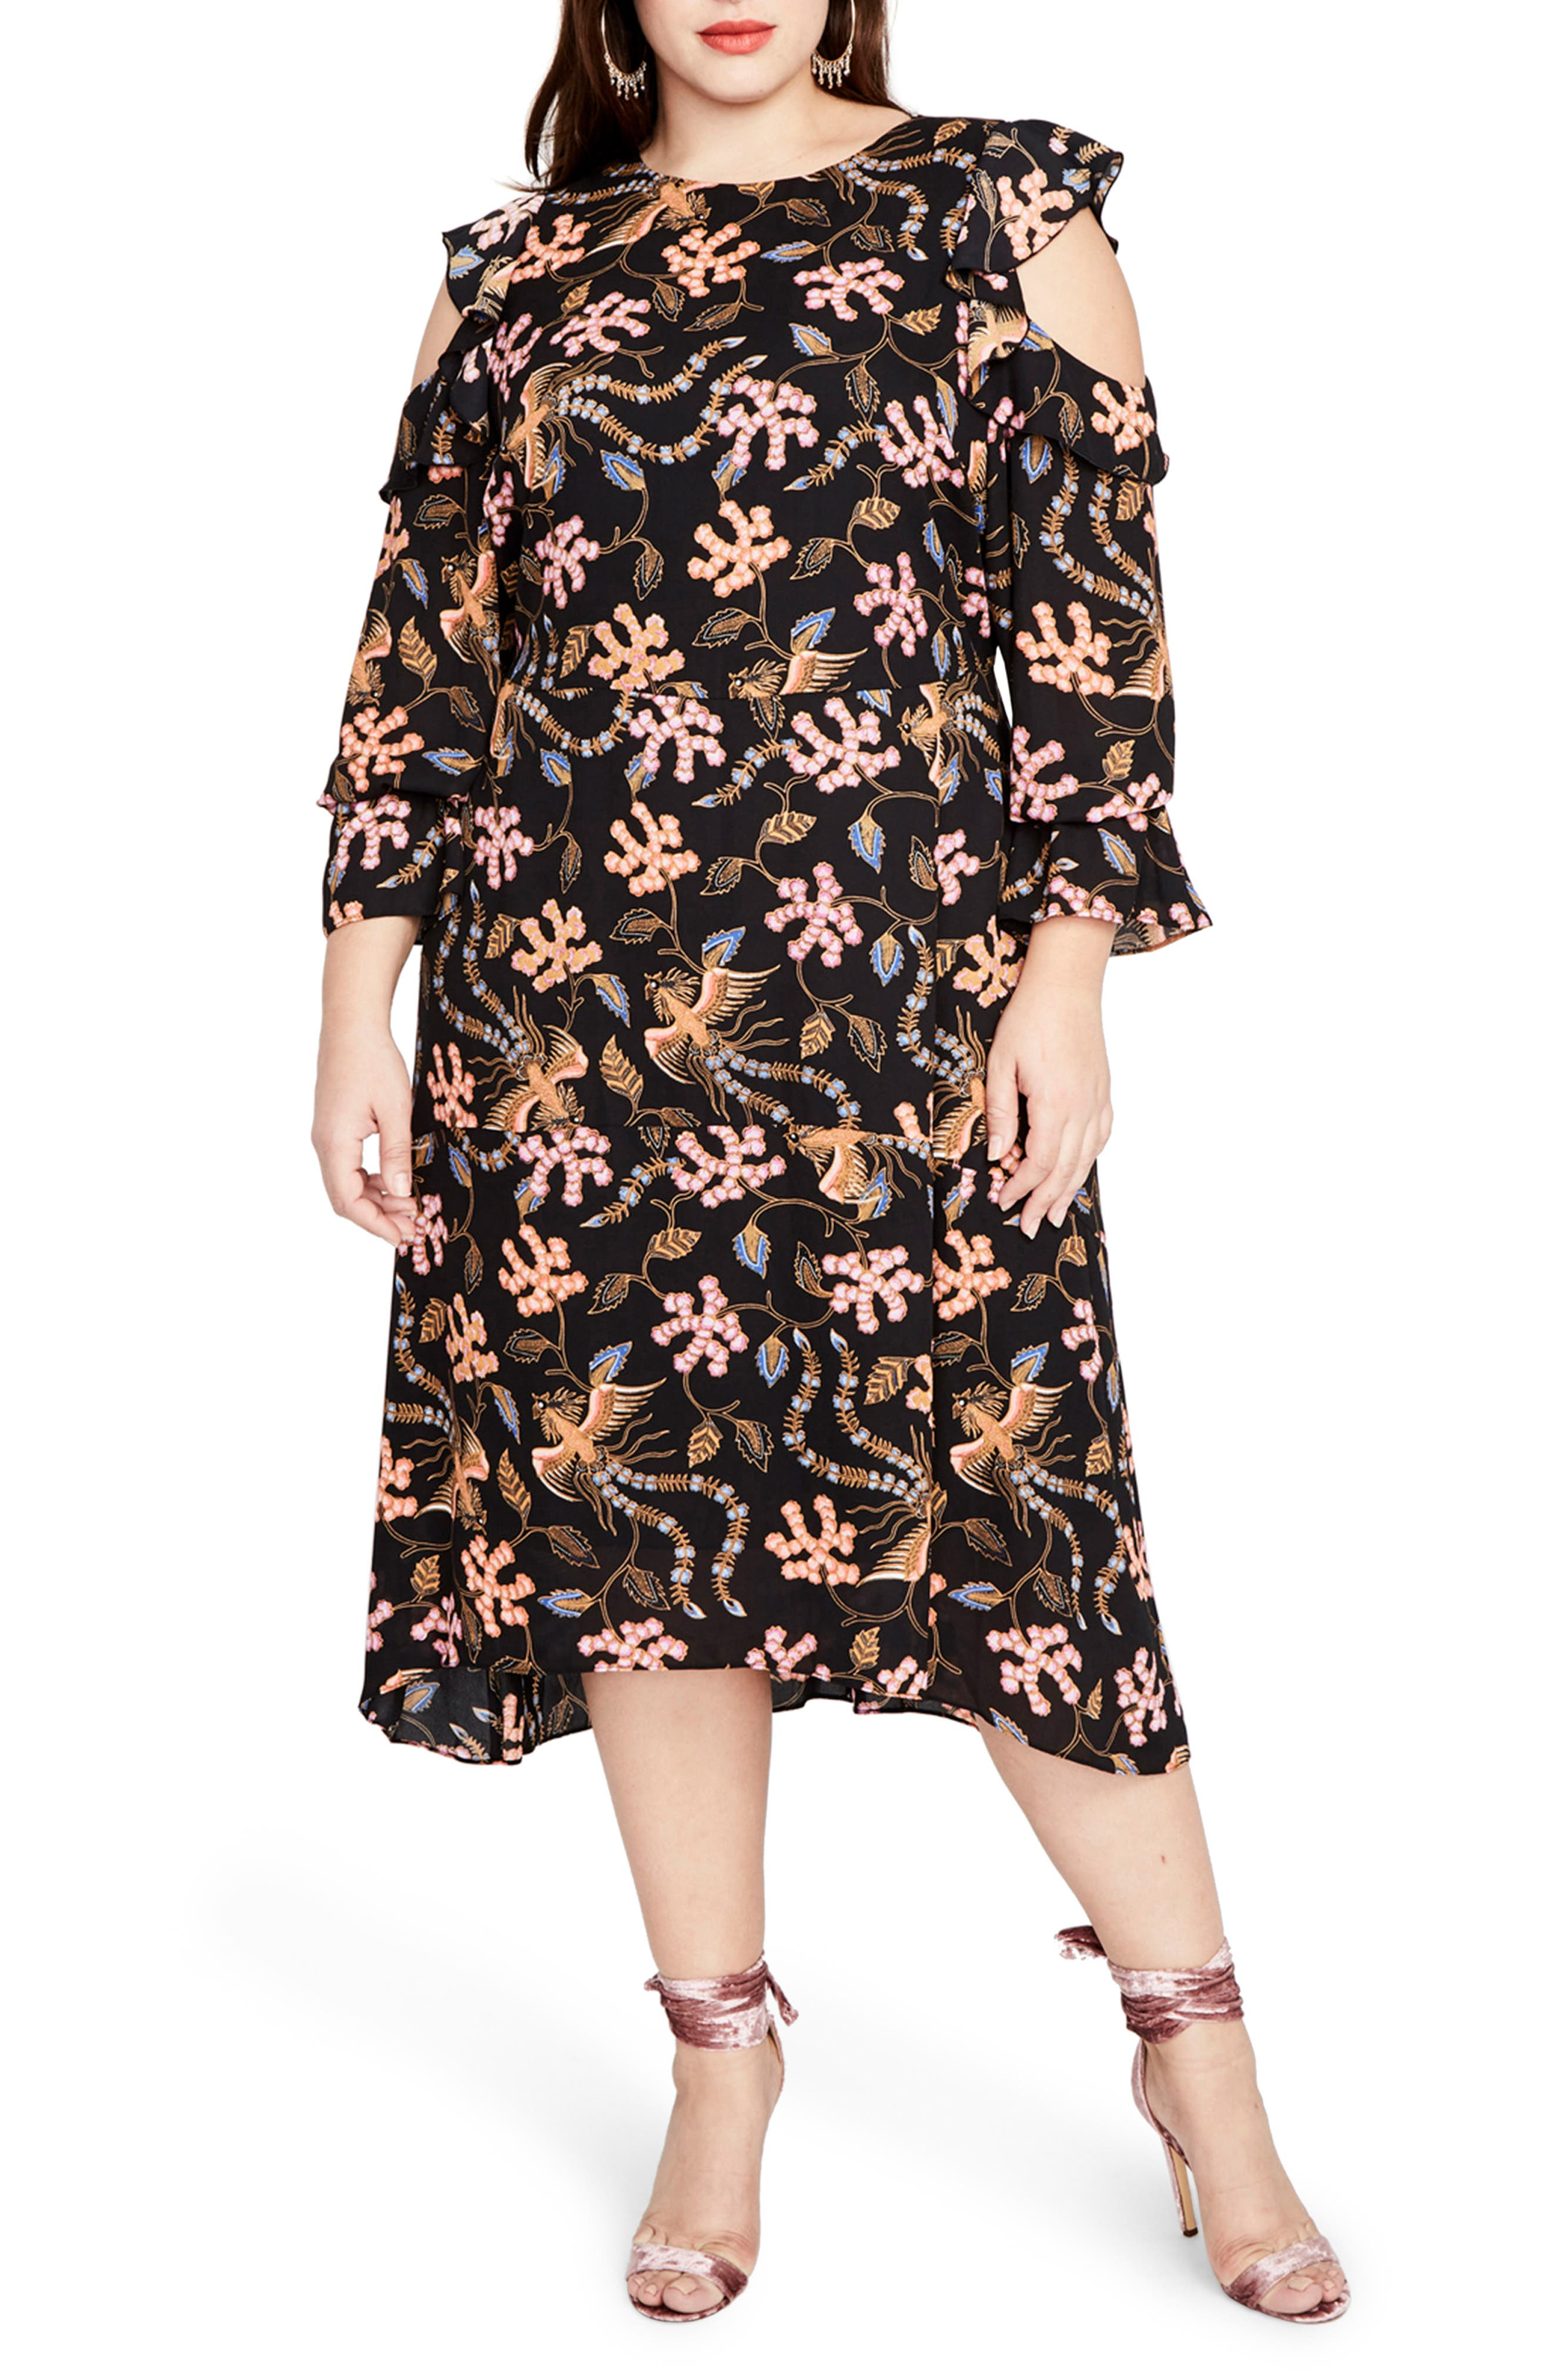 RACHEL BY Rachel Roy Cold Shoulder Ruffle Midi Dress,                             Main thumbnail 1, color,                             Black Multi